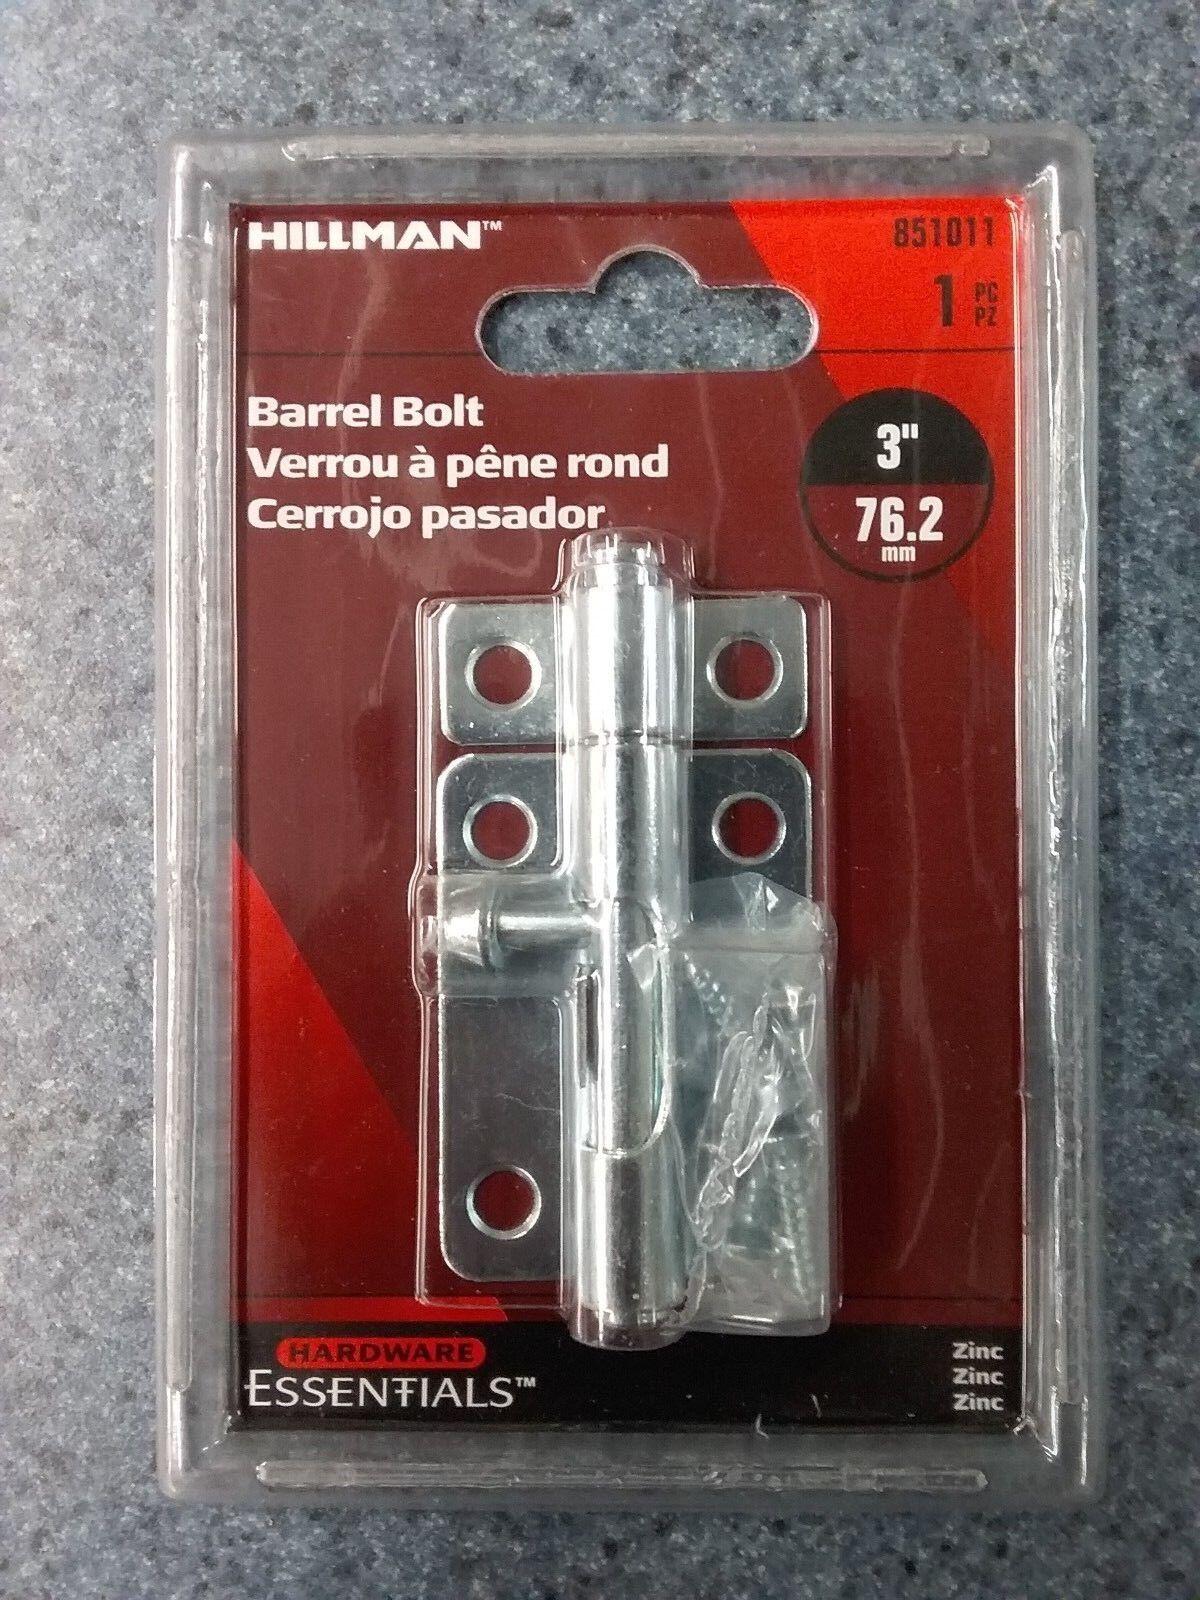 Hillman Hardware Essentials 851011 Barrel Bolt Zinc-plated 3